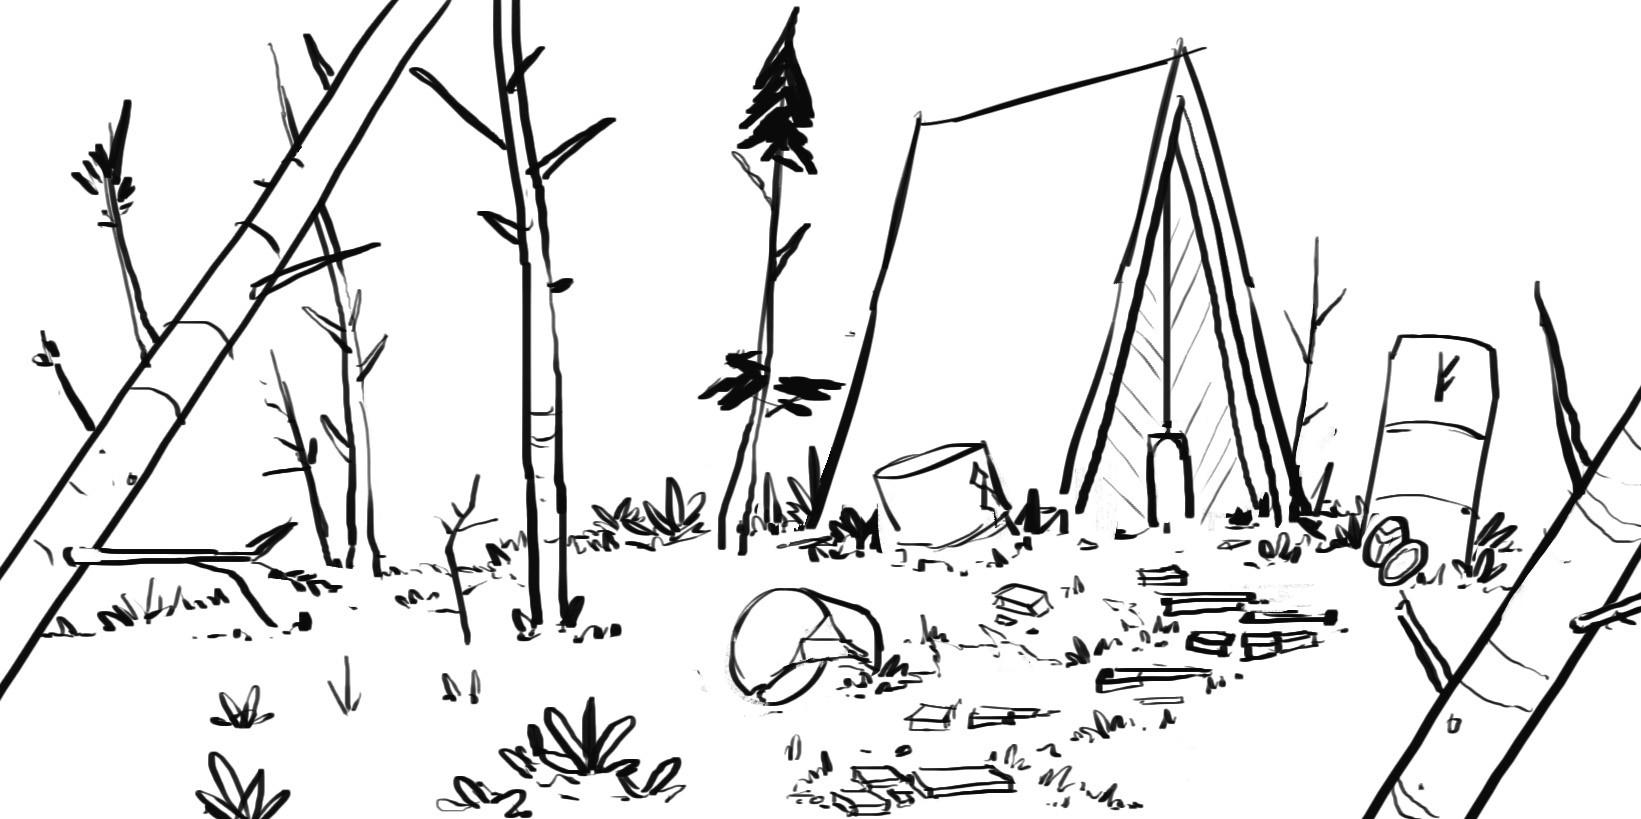 Tim kaminski sketch